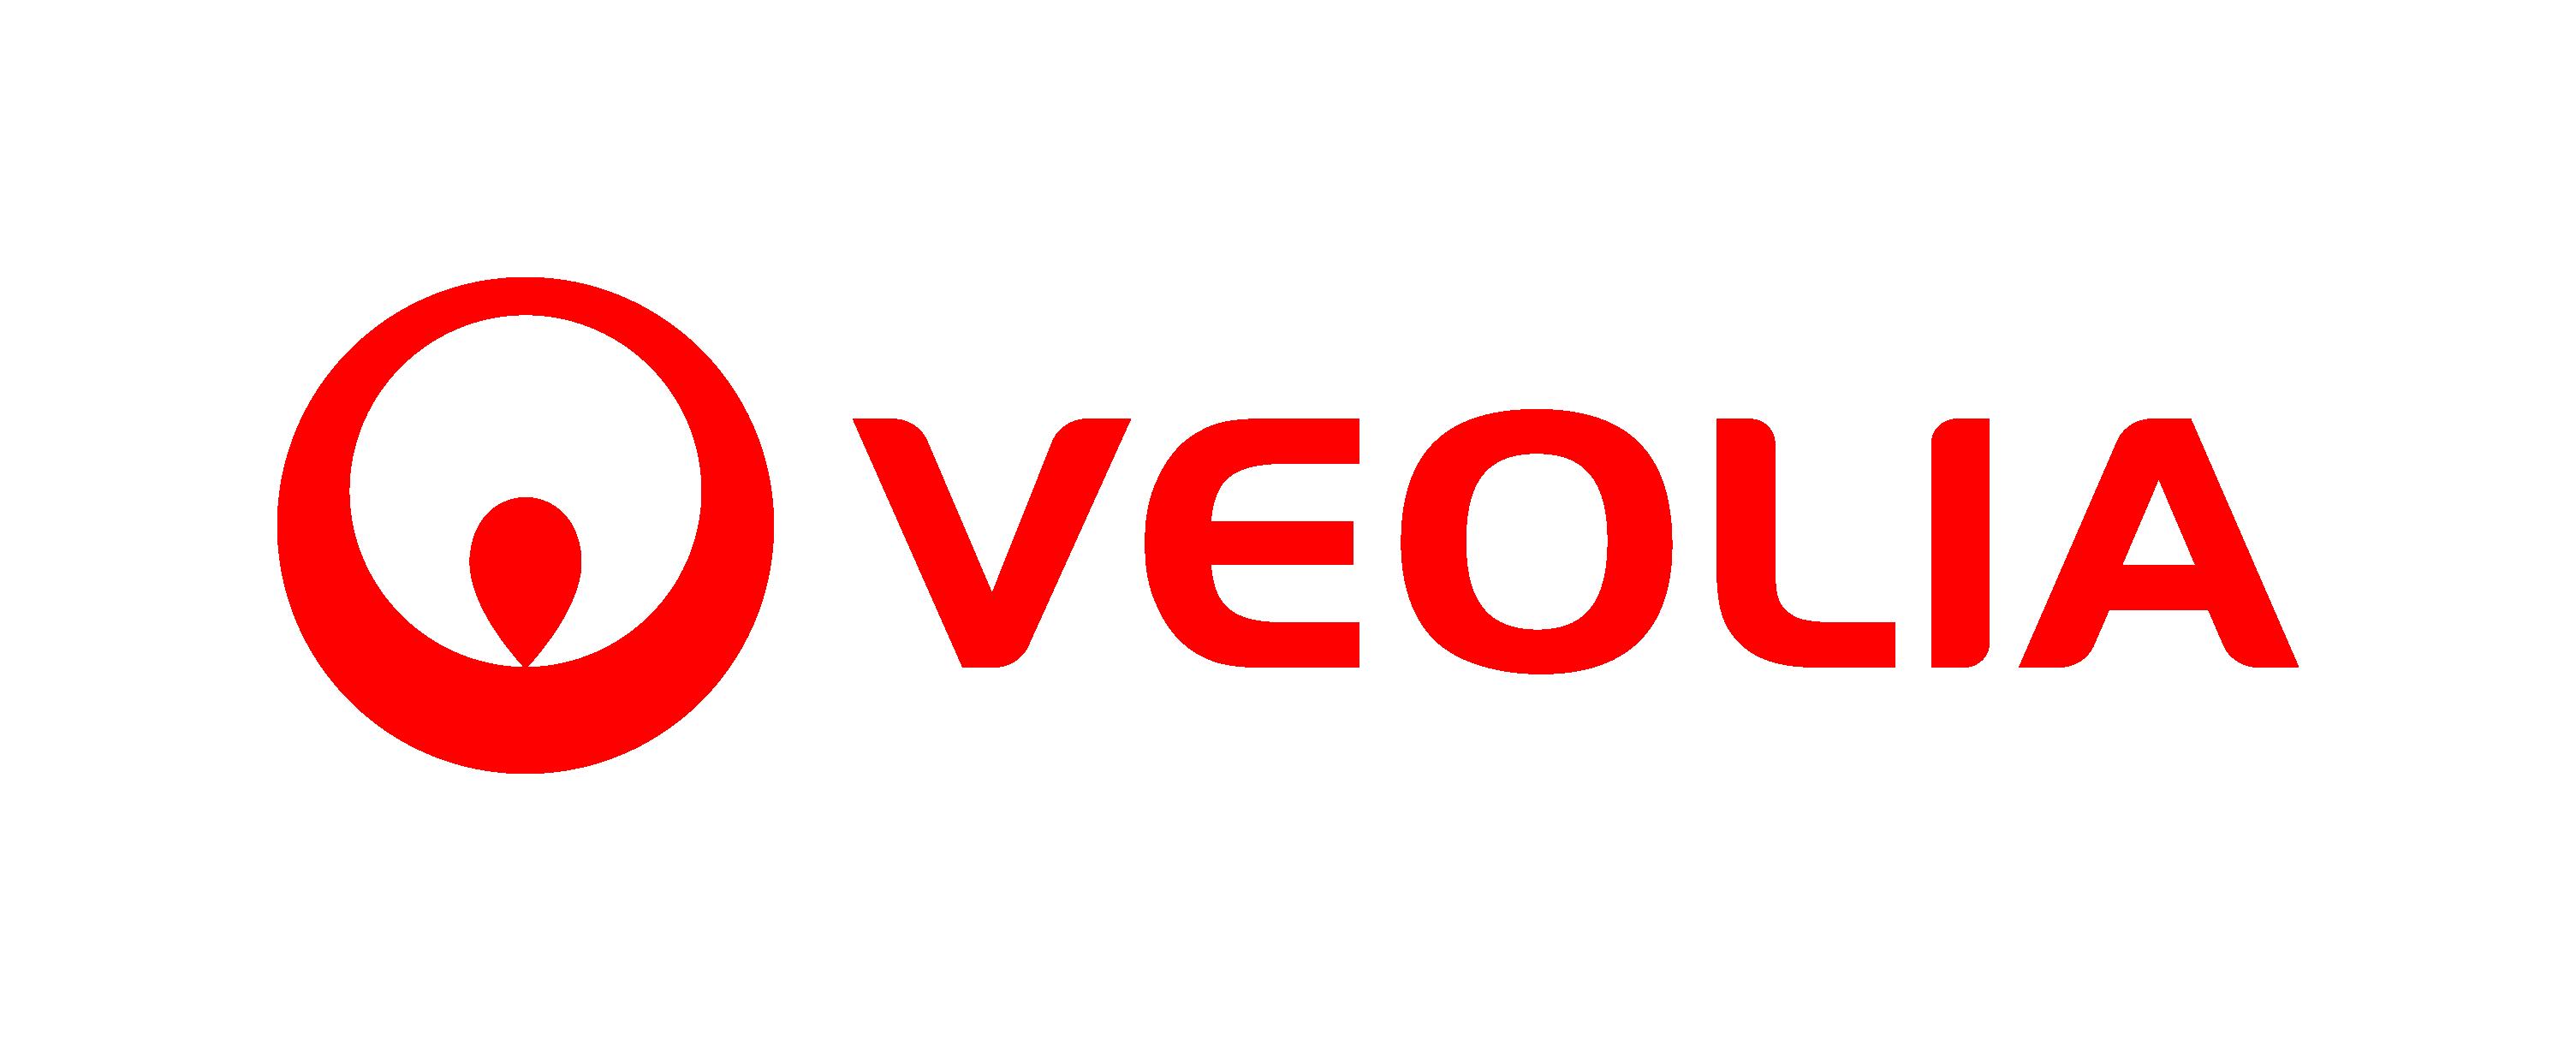 Carreiras - Veolia